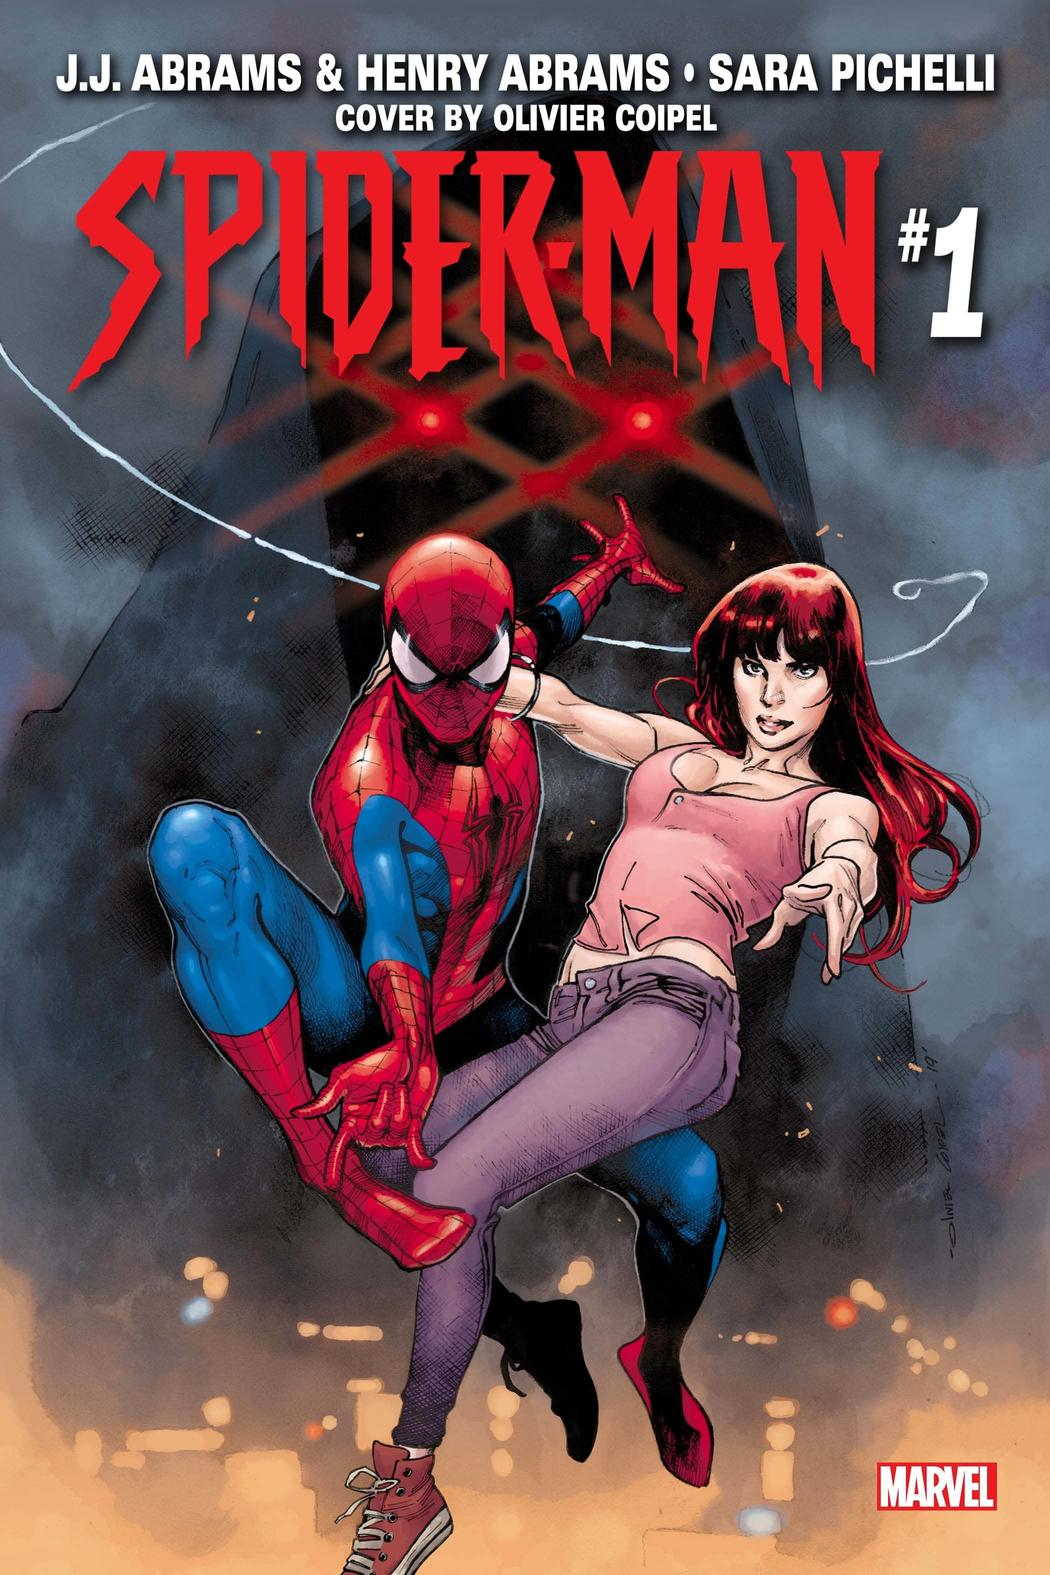 J.J. Abrams takes on Spider-Man